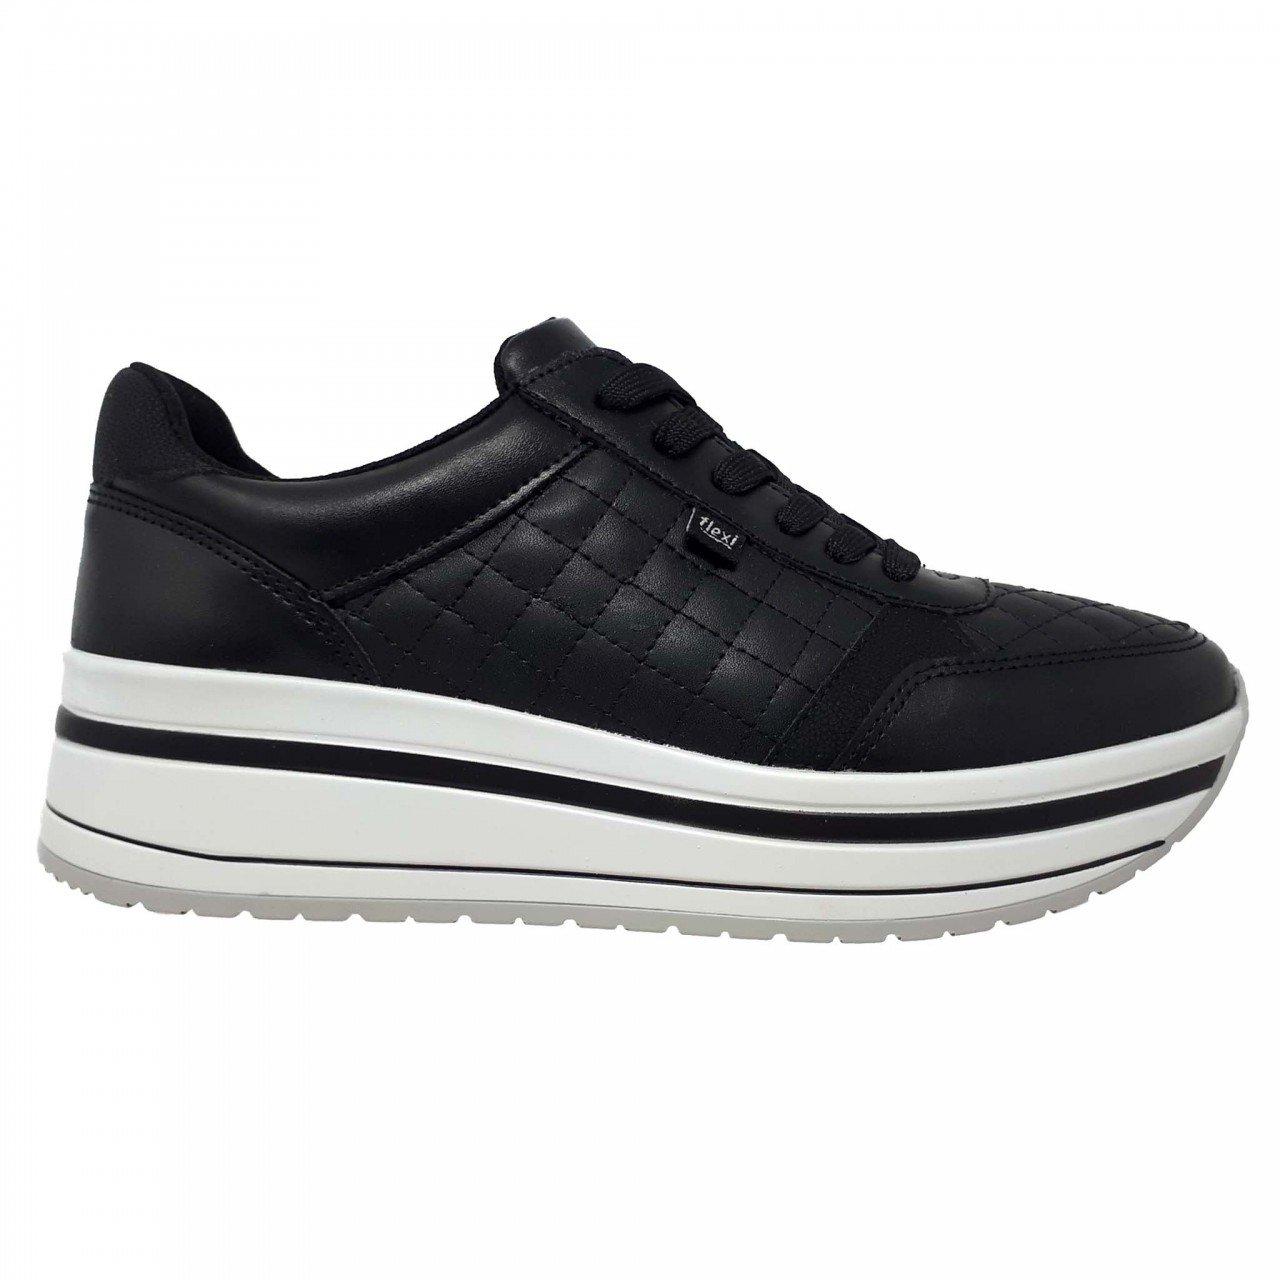 Tenis de plataforma negro para mujer Flexi 101007